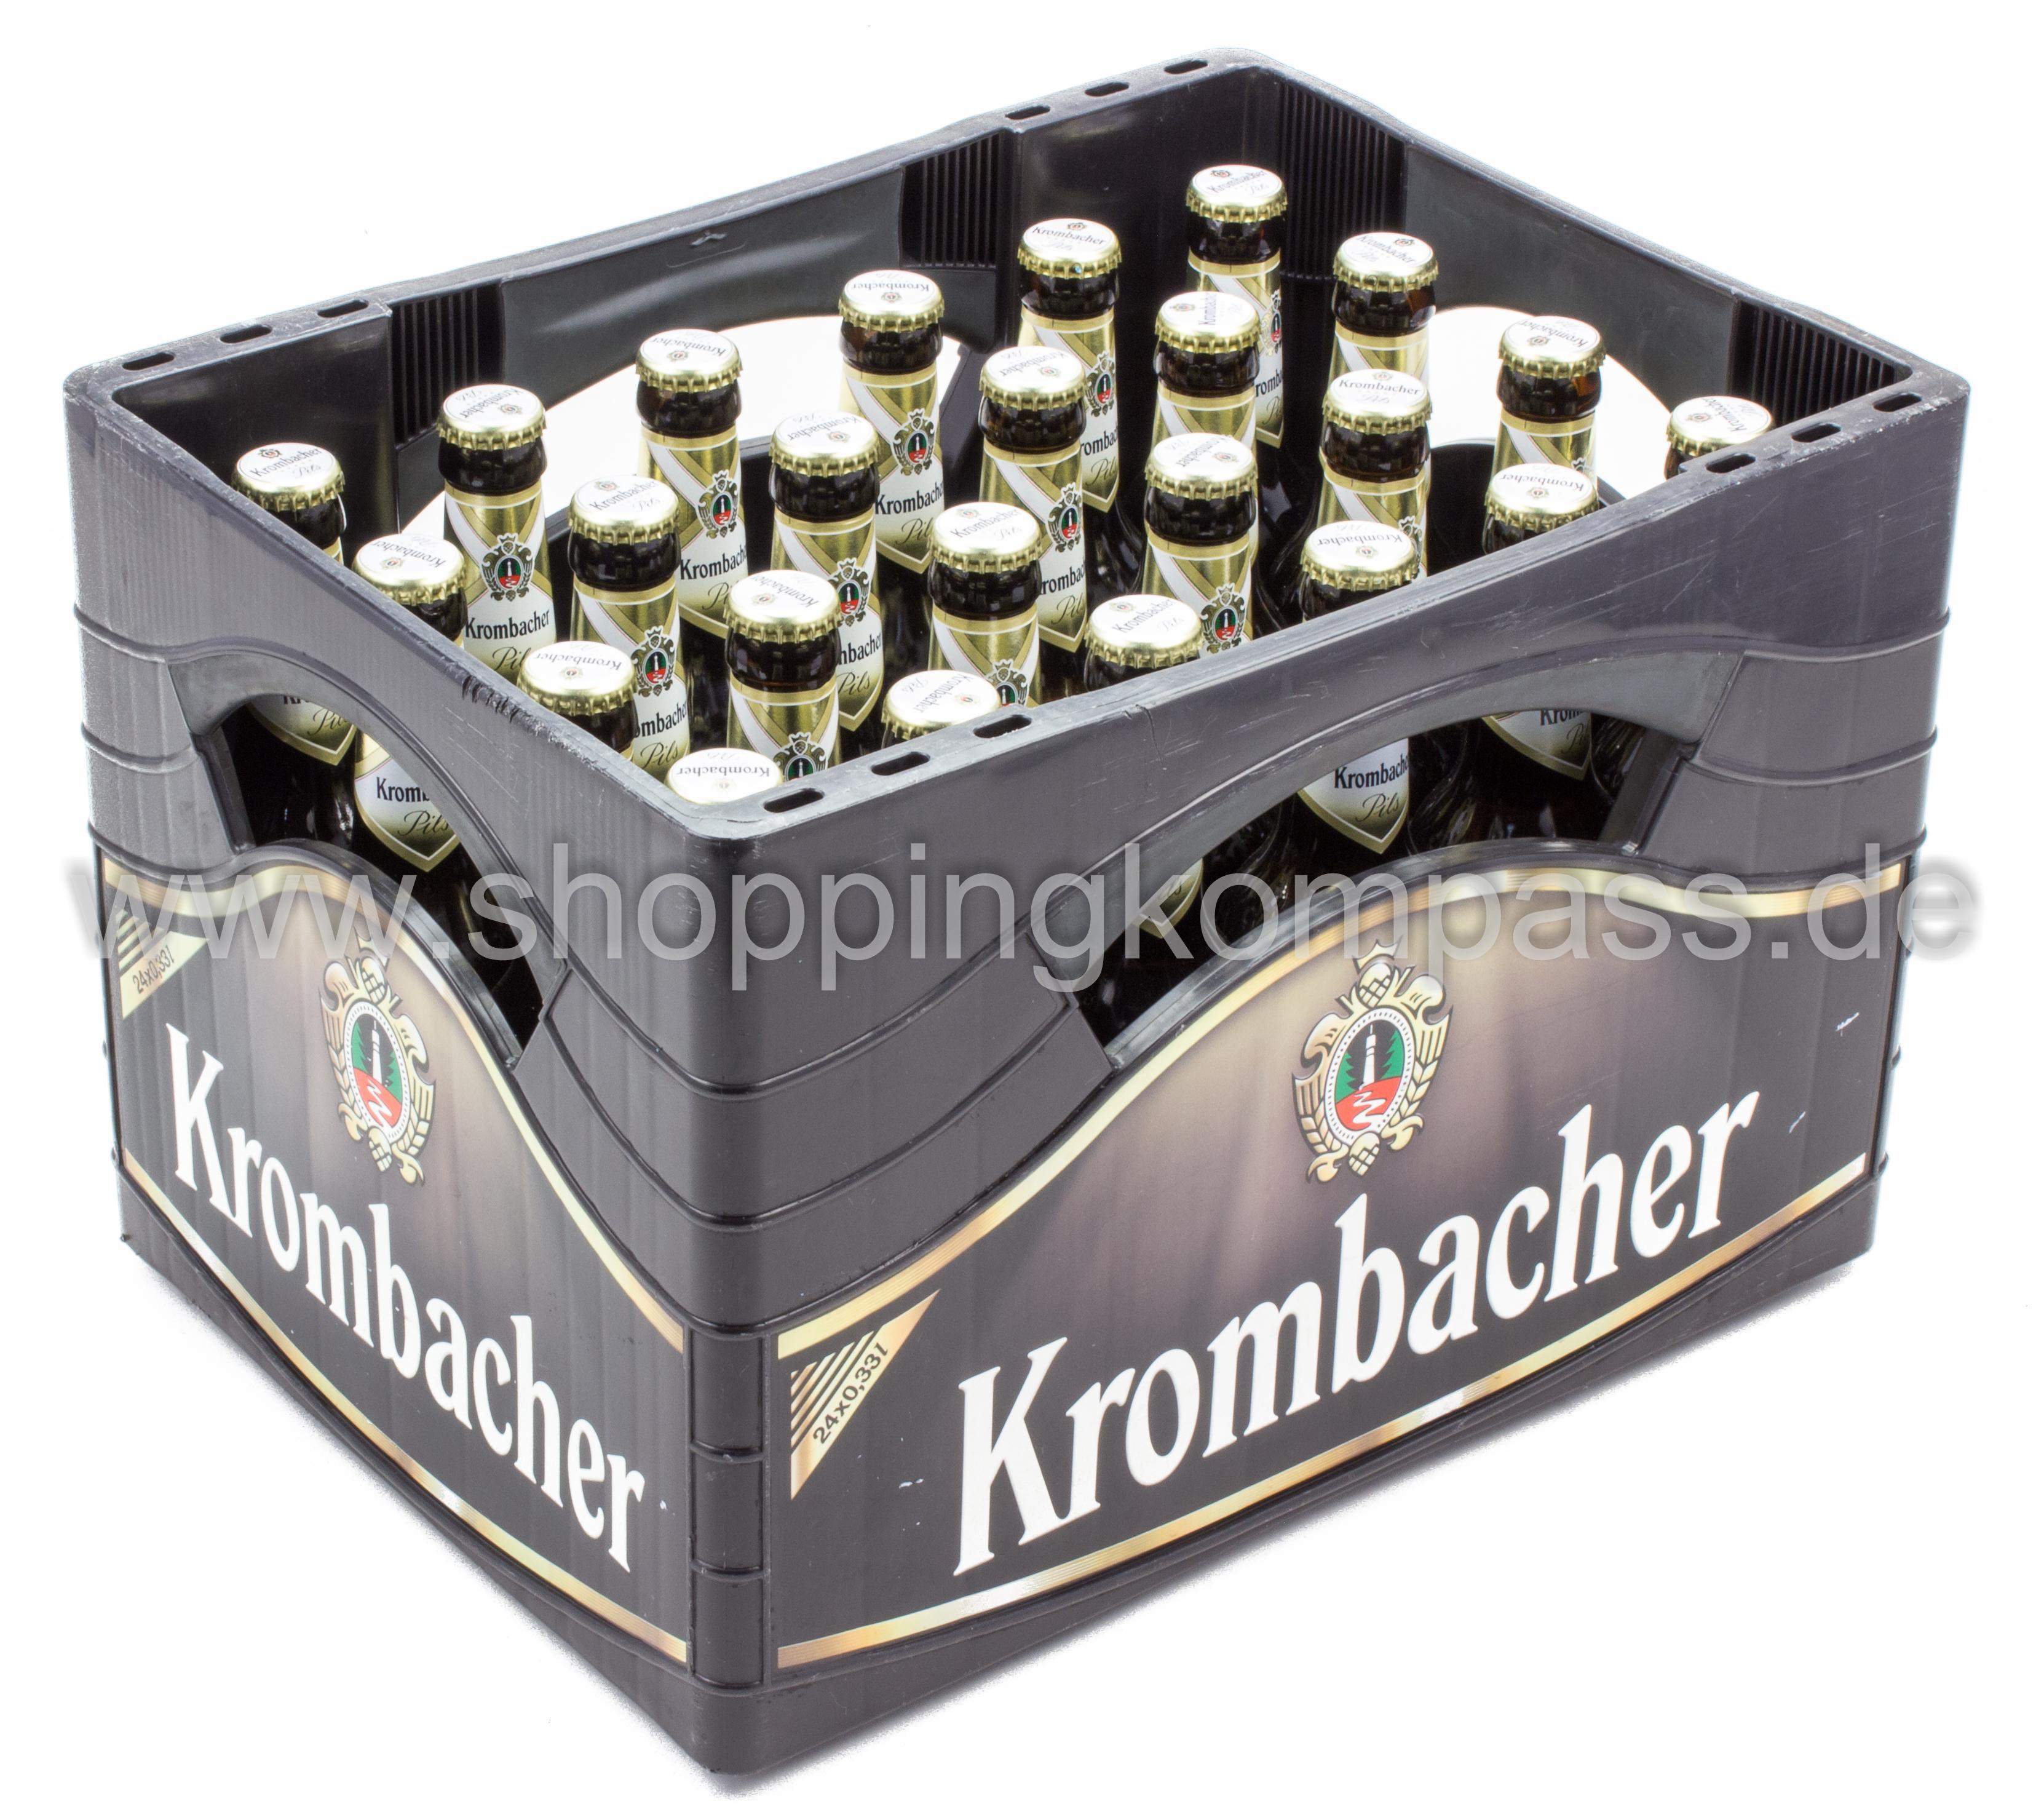 Krombacher Pils Kasten 24 X 033 L Glas Mehrweg